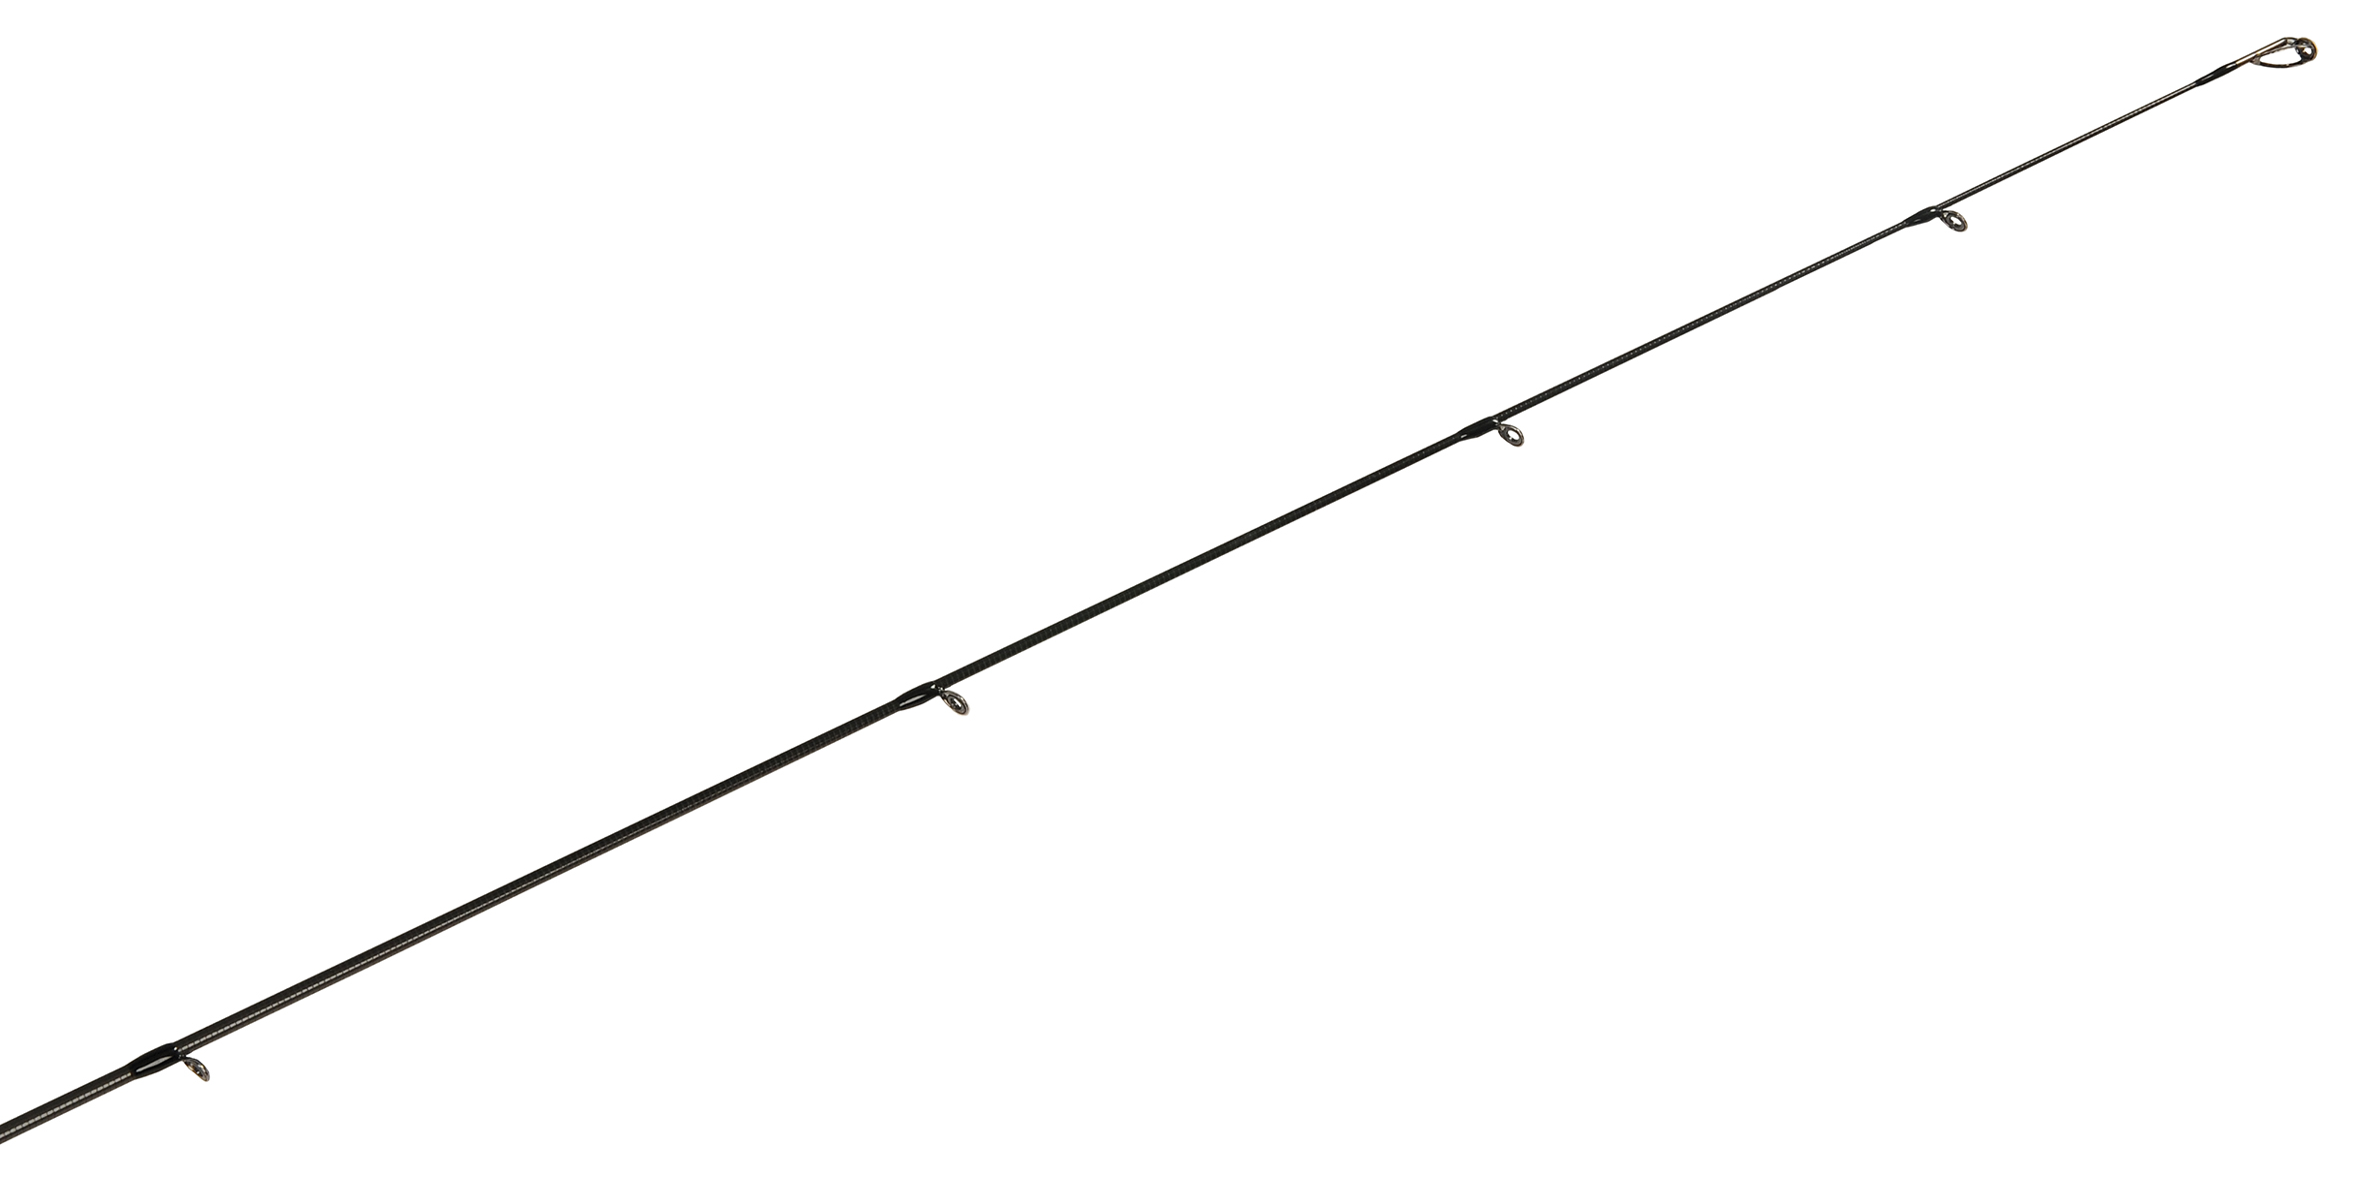 Удилище НАВАХО Спиннер (Рыболов), 2.13м, 2,5-8г